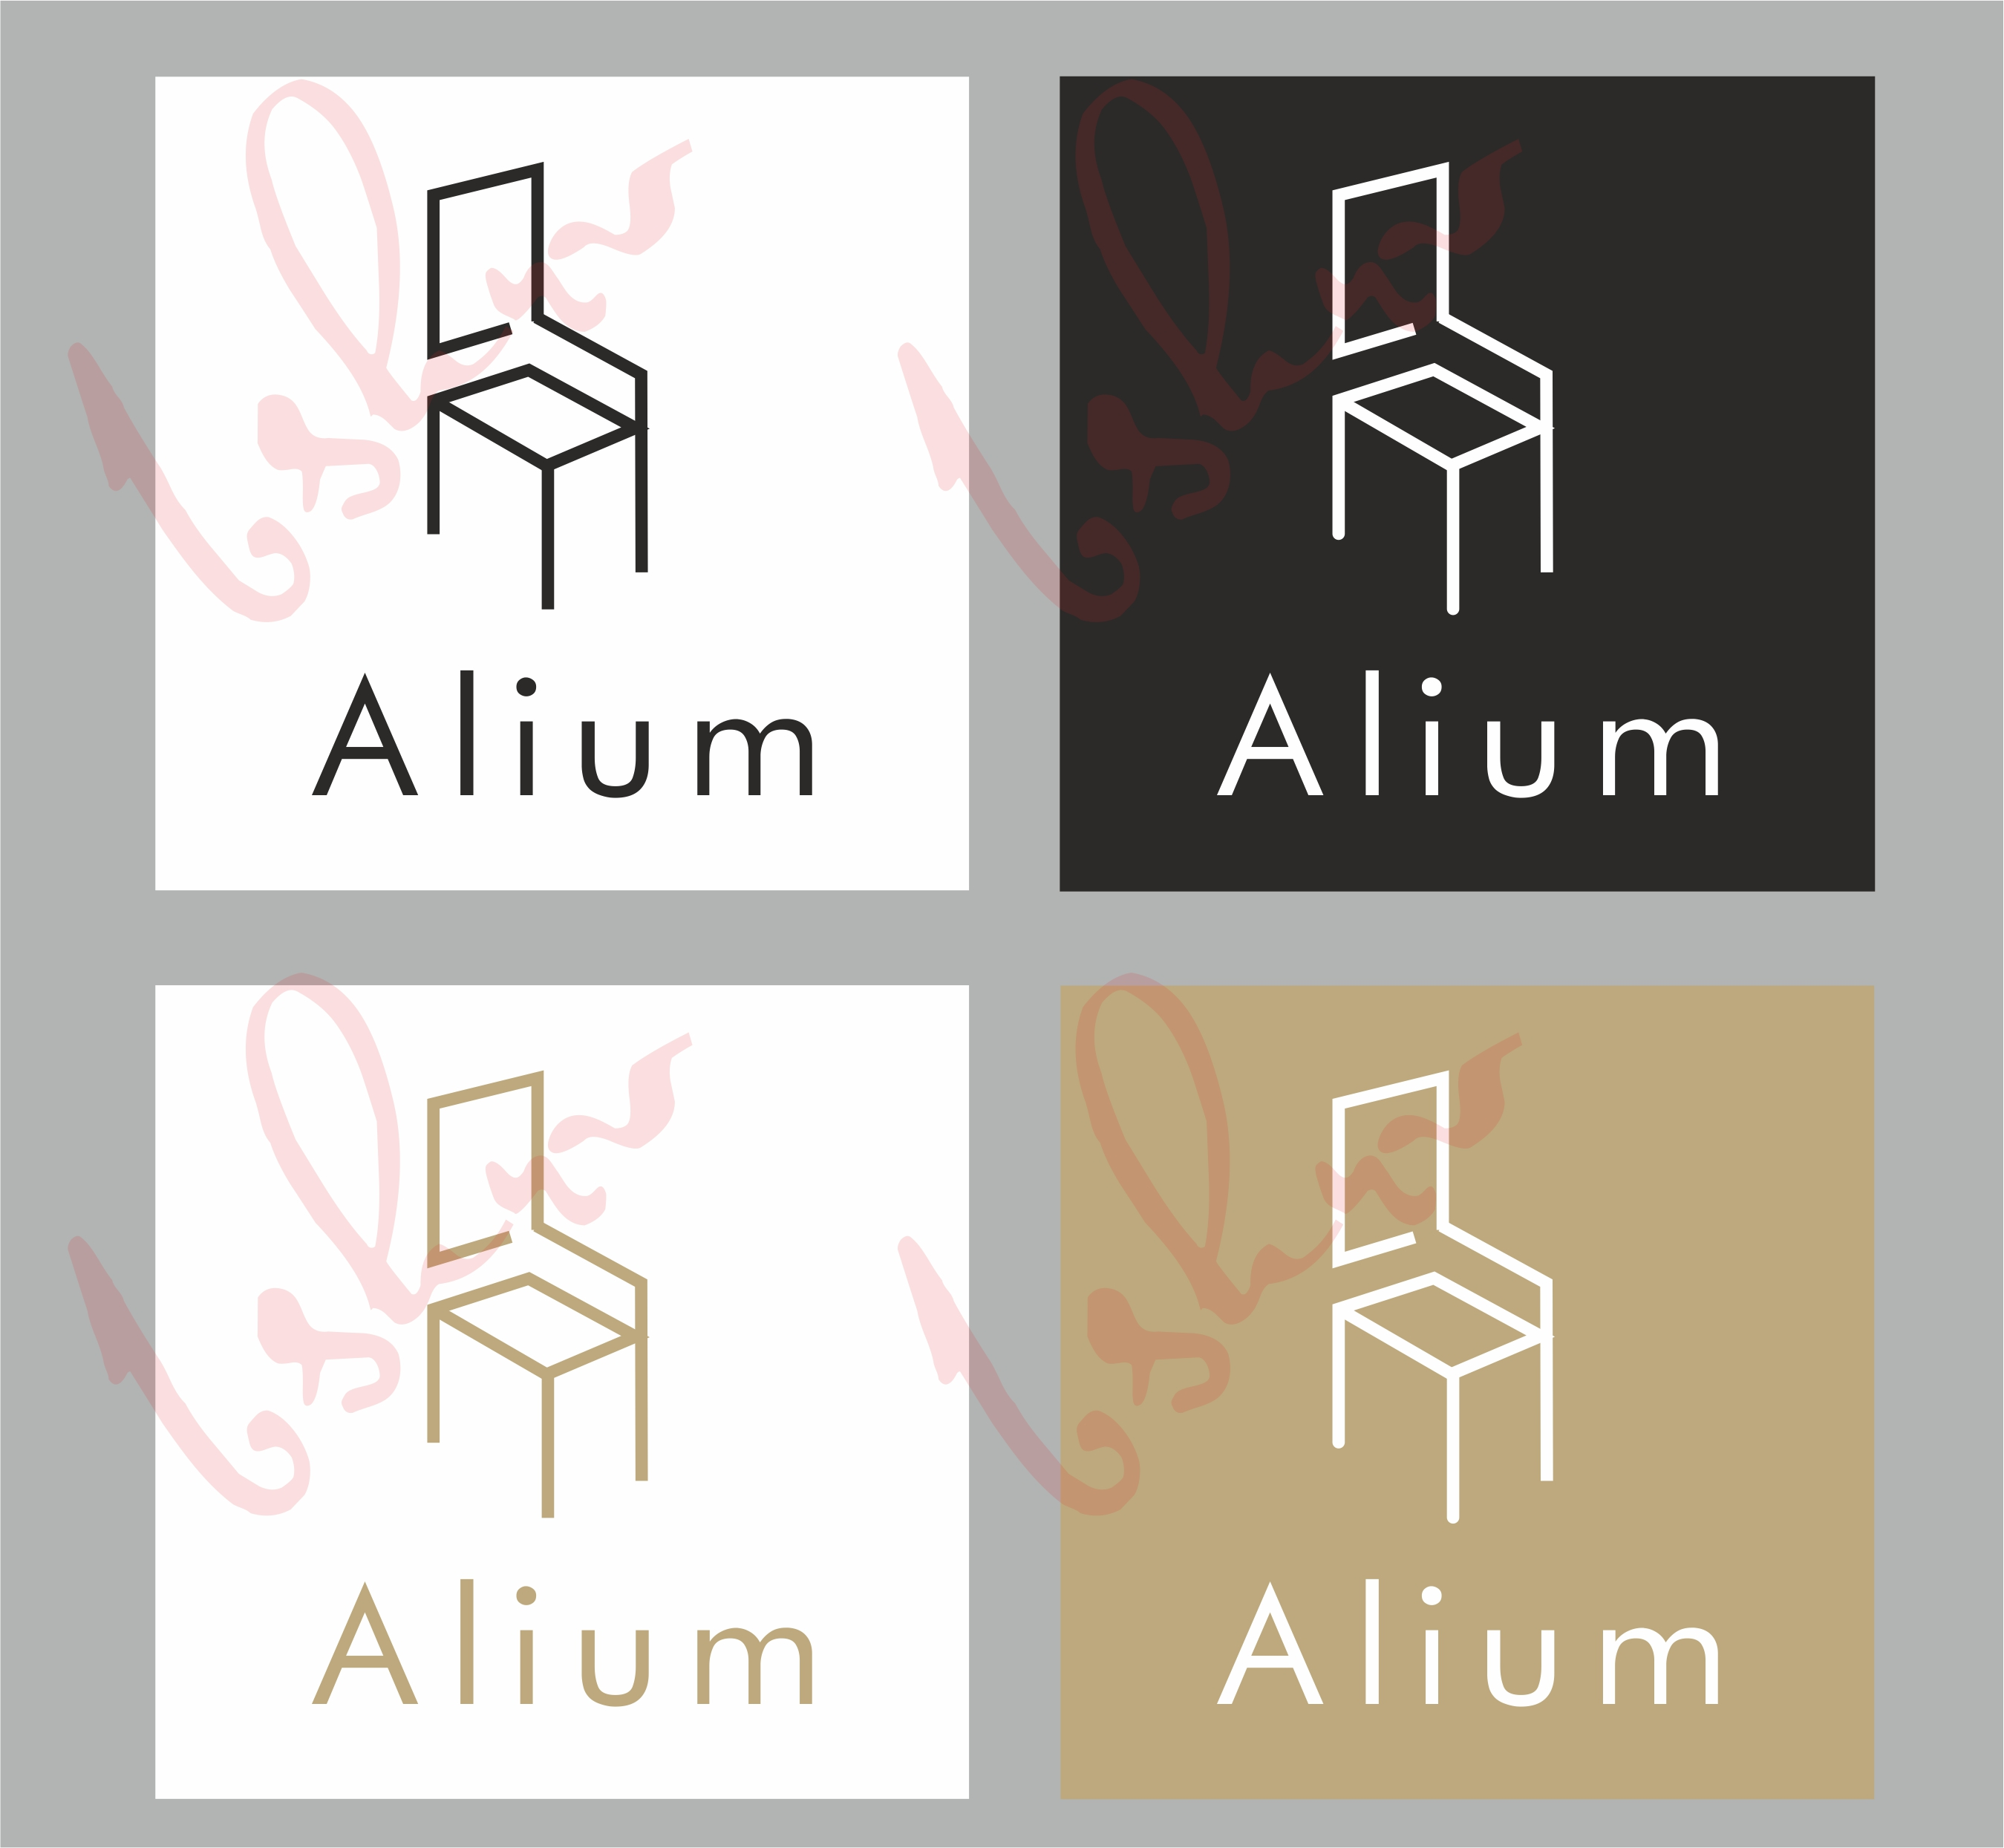 Логотип для дизайн студии фото f_43259de99ea91f02.jpg